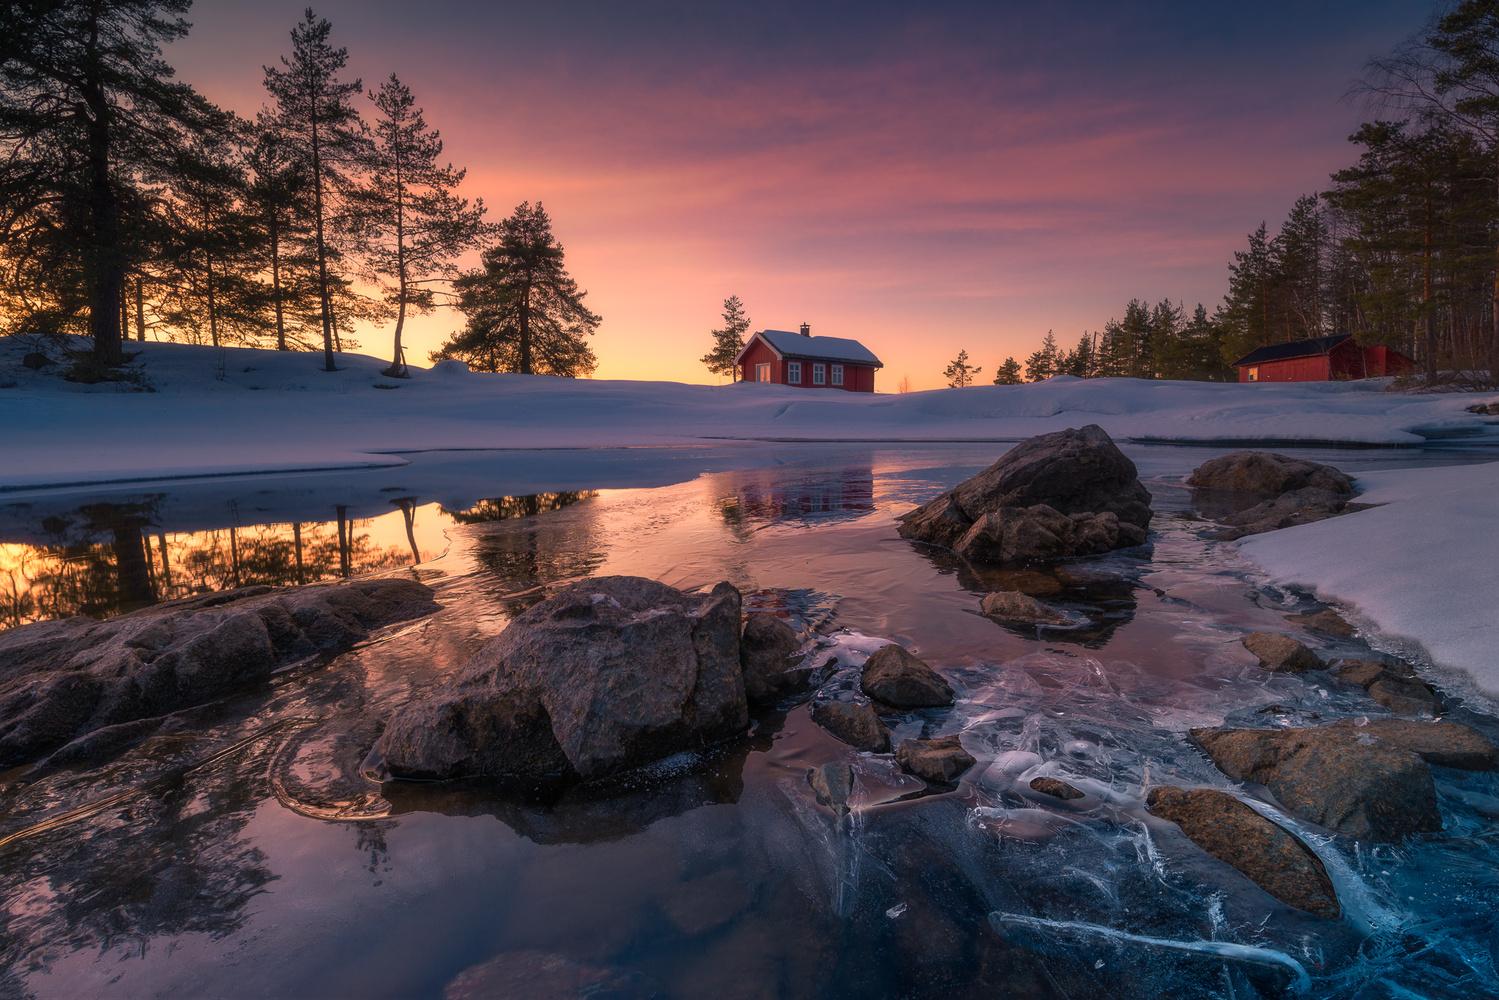 Under a Red Sky by Ole Henrik Skjelstad